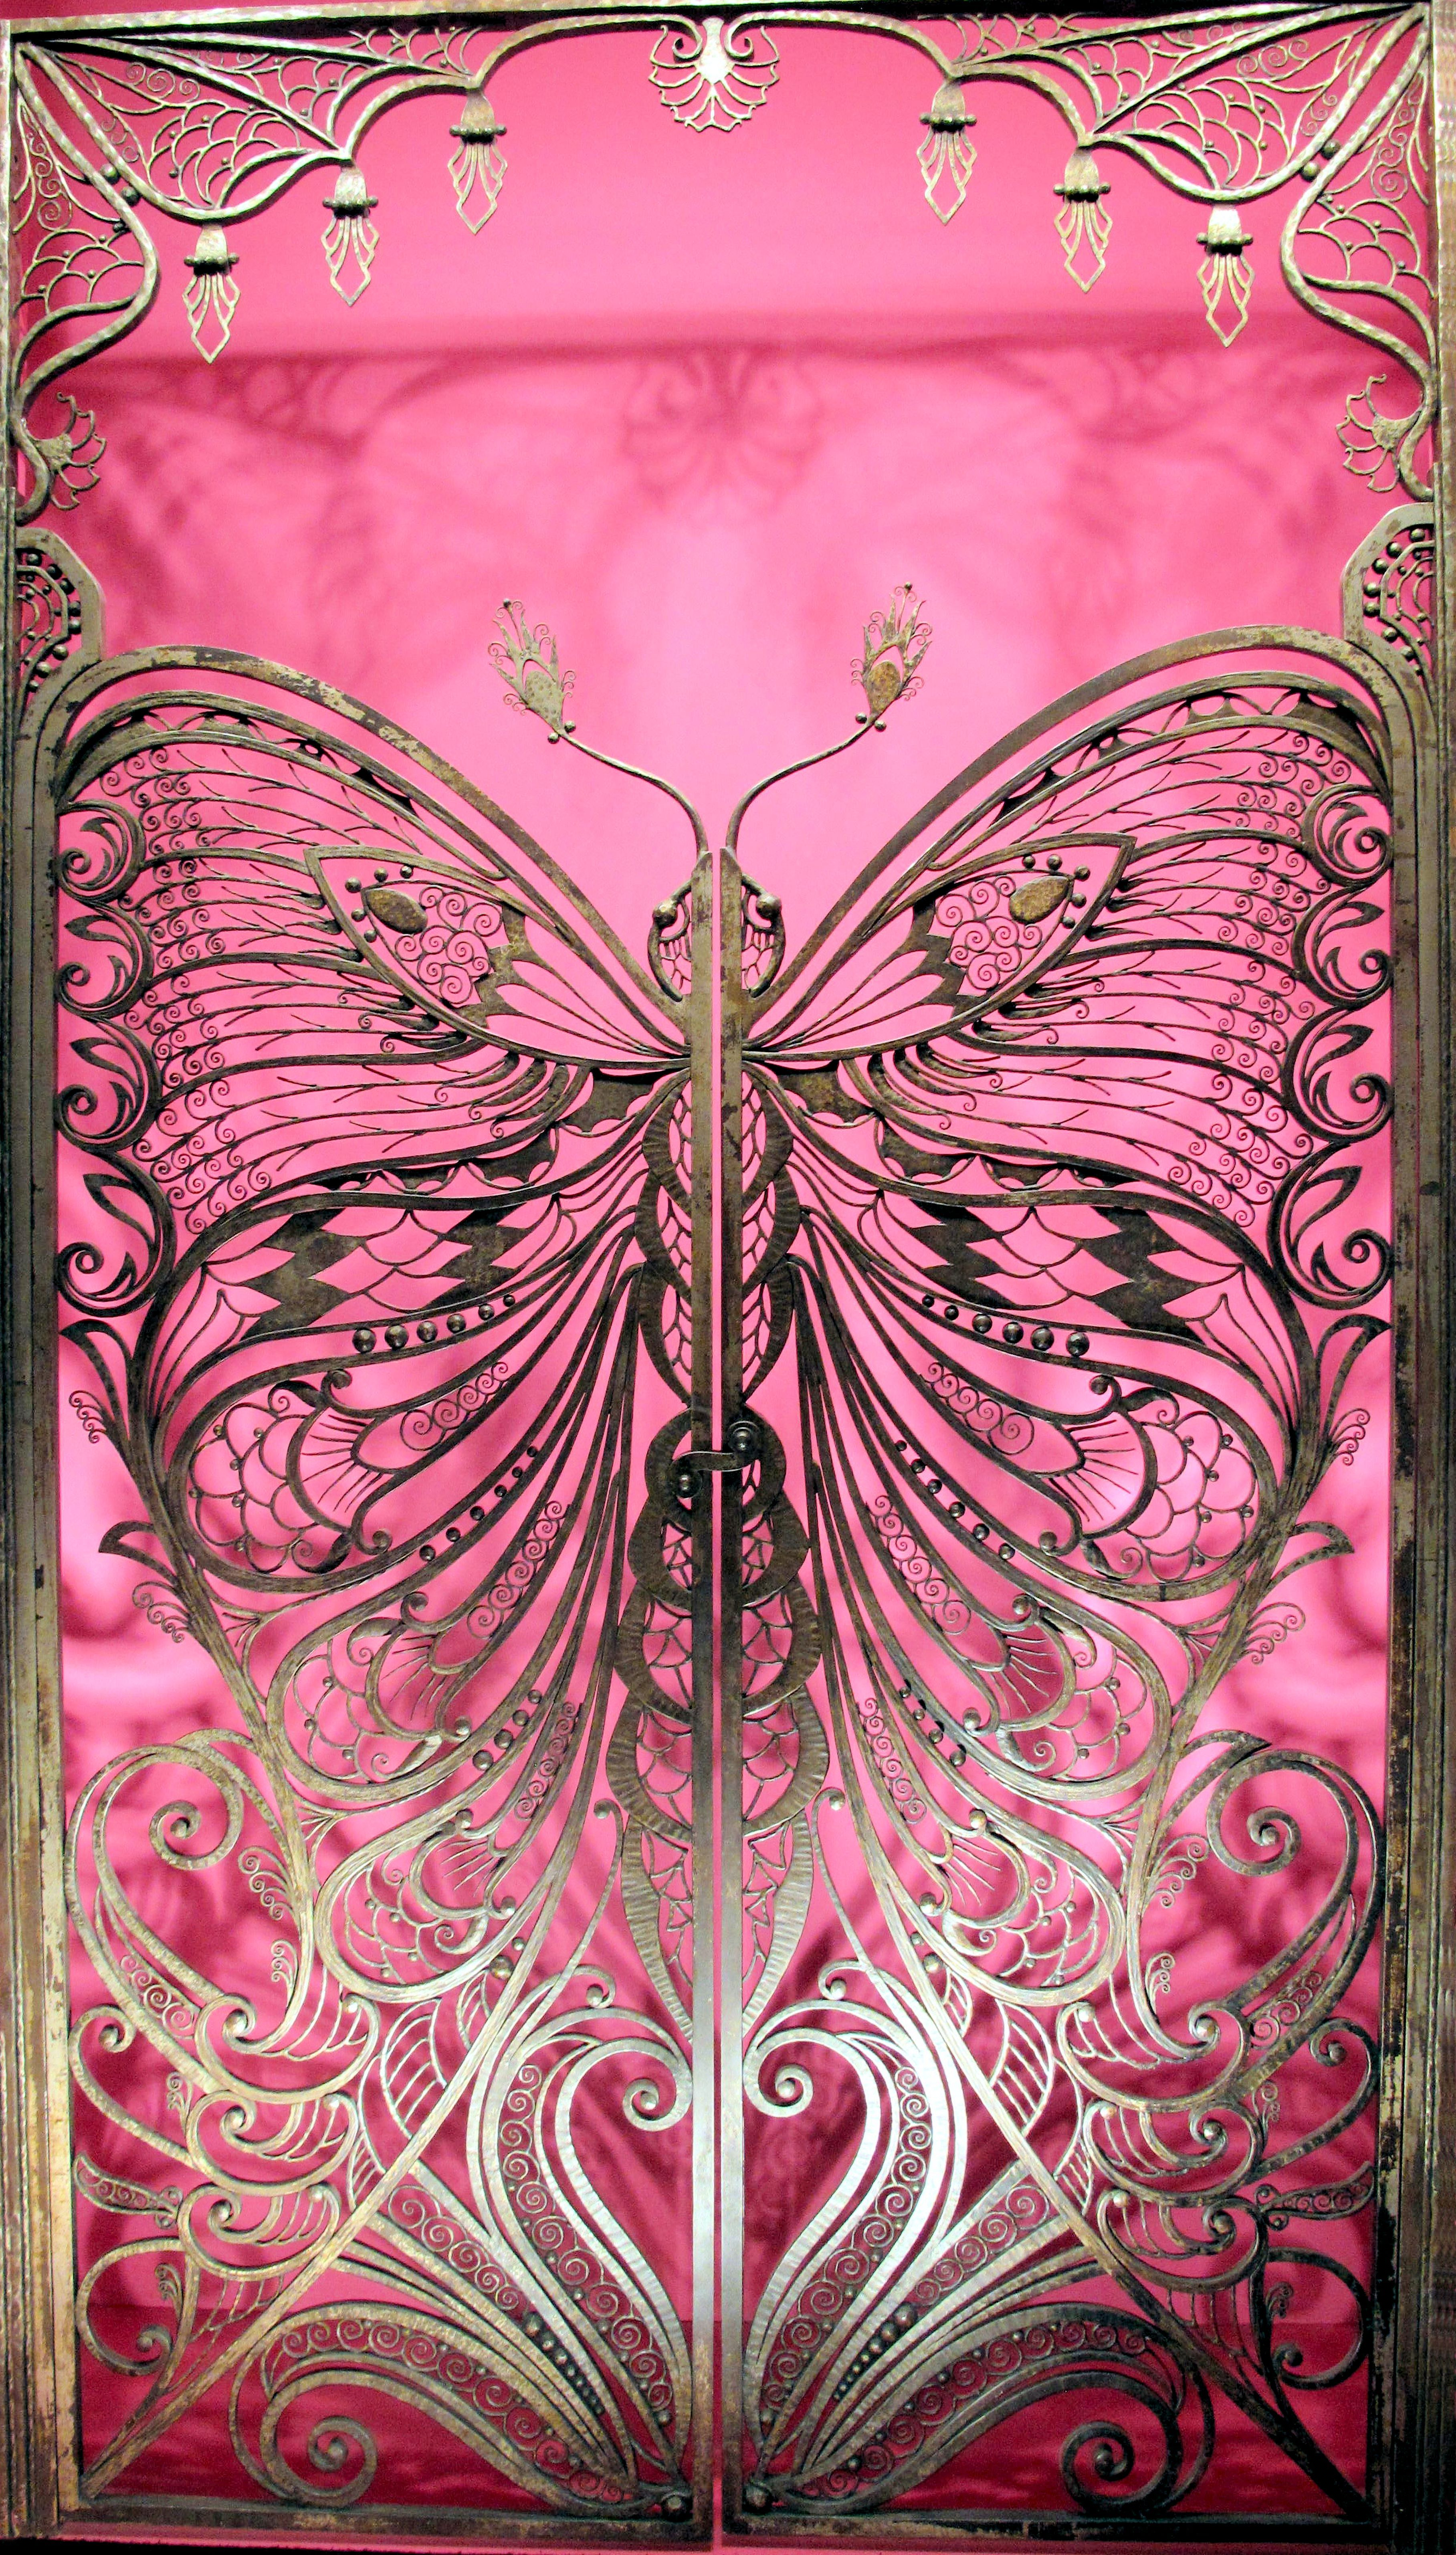 emilie robert butterfly gate brooklyn museum of art new york c 1900 wrought iron art. Black Bedroom Furniture Sets. Home Design Ideas